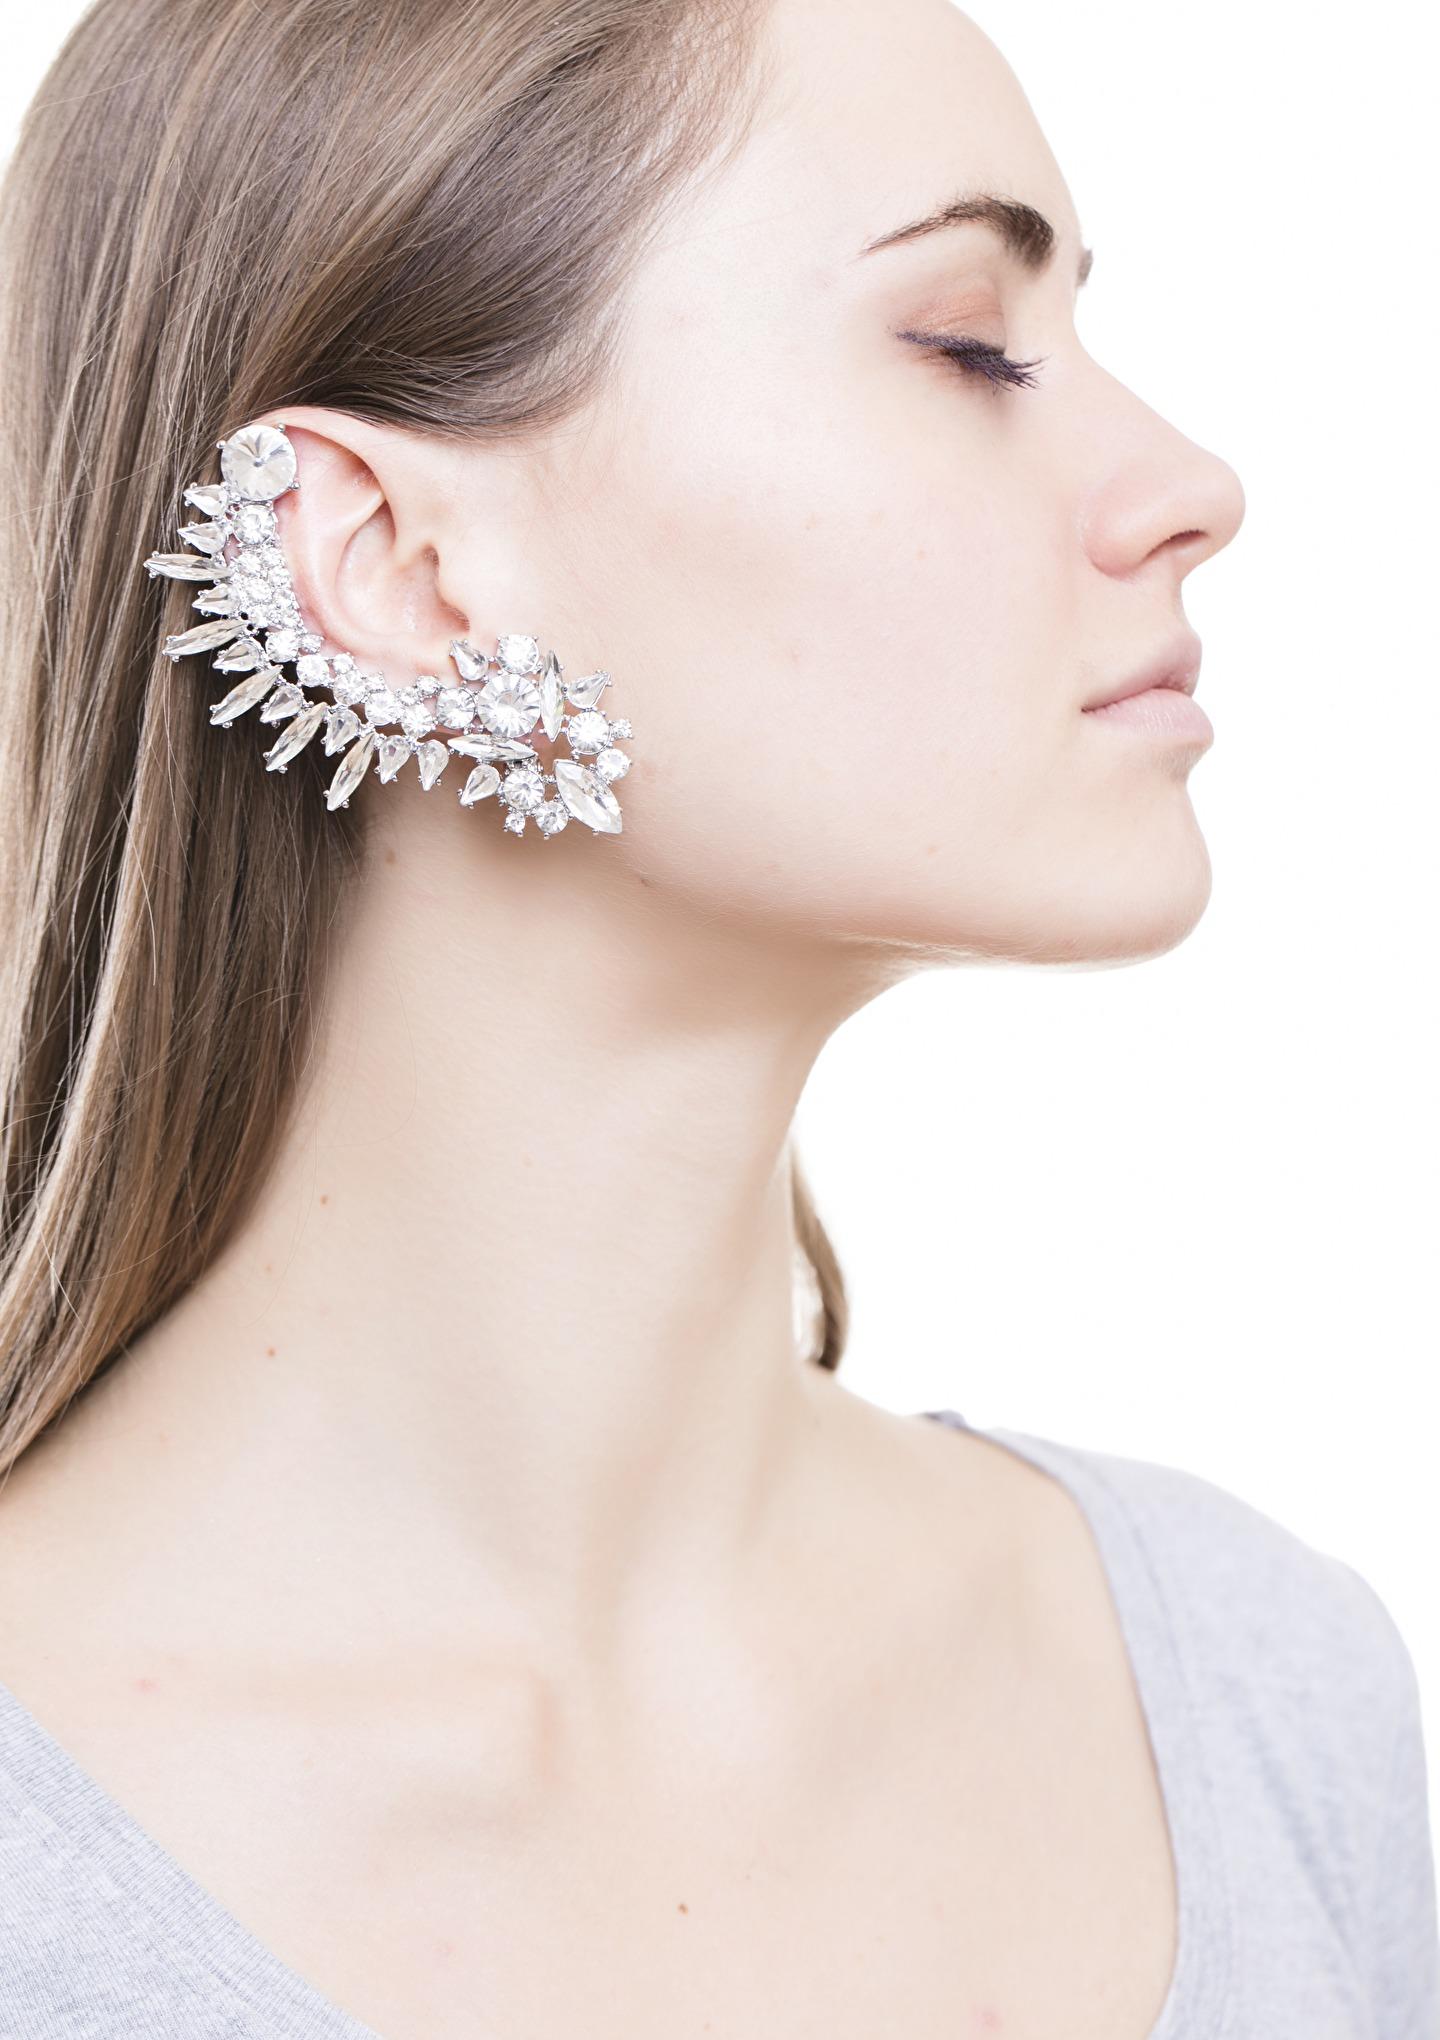 rock-chic-statement-full-ear-cuff-in-silver